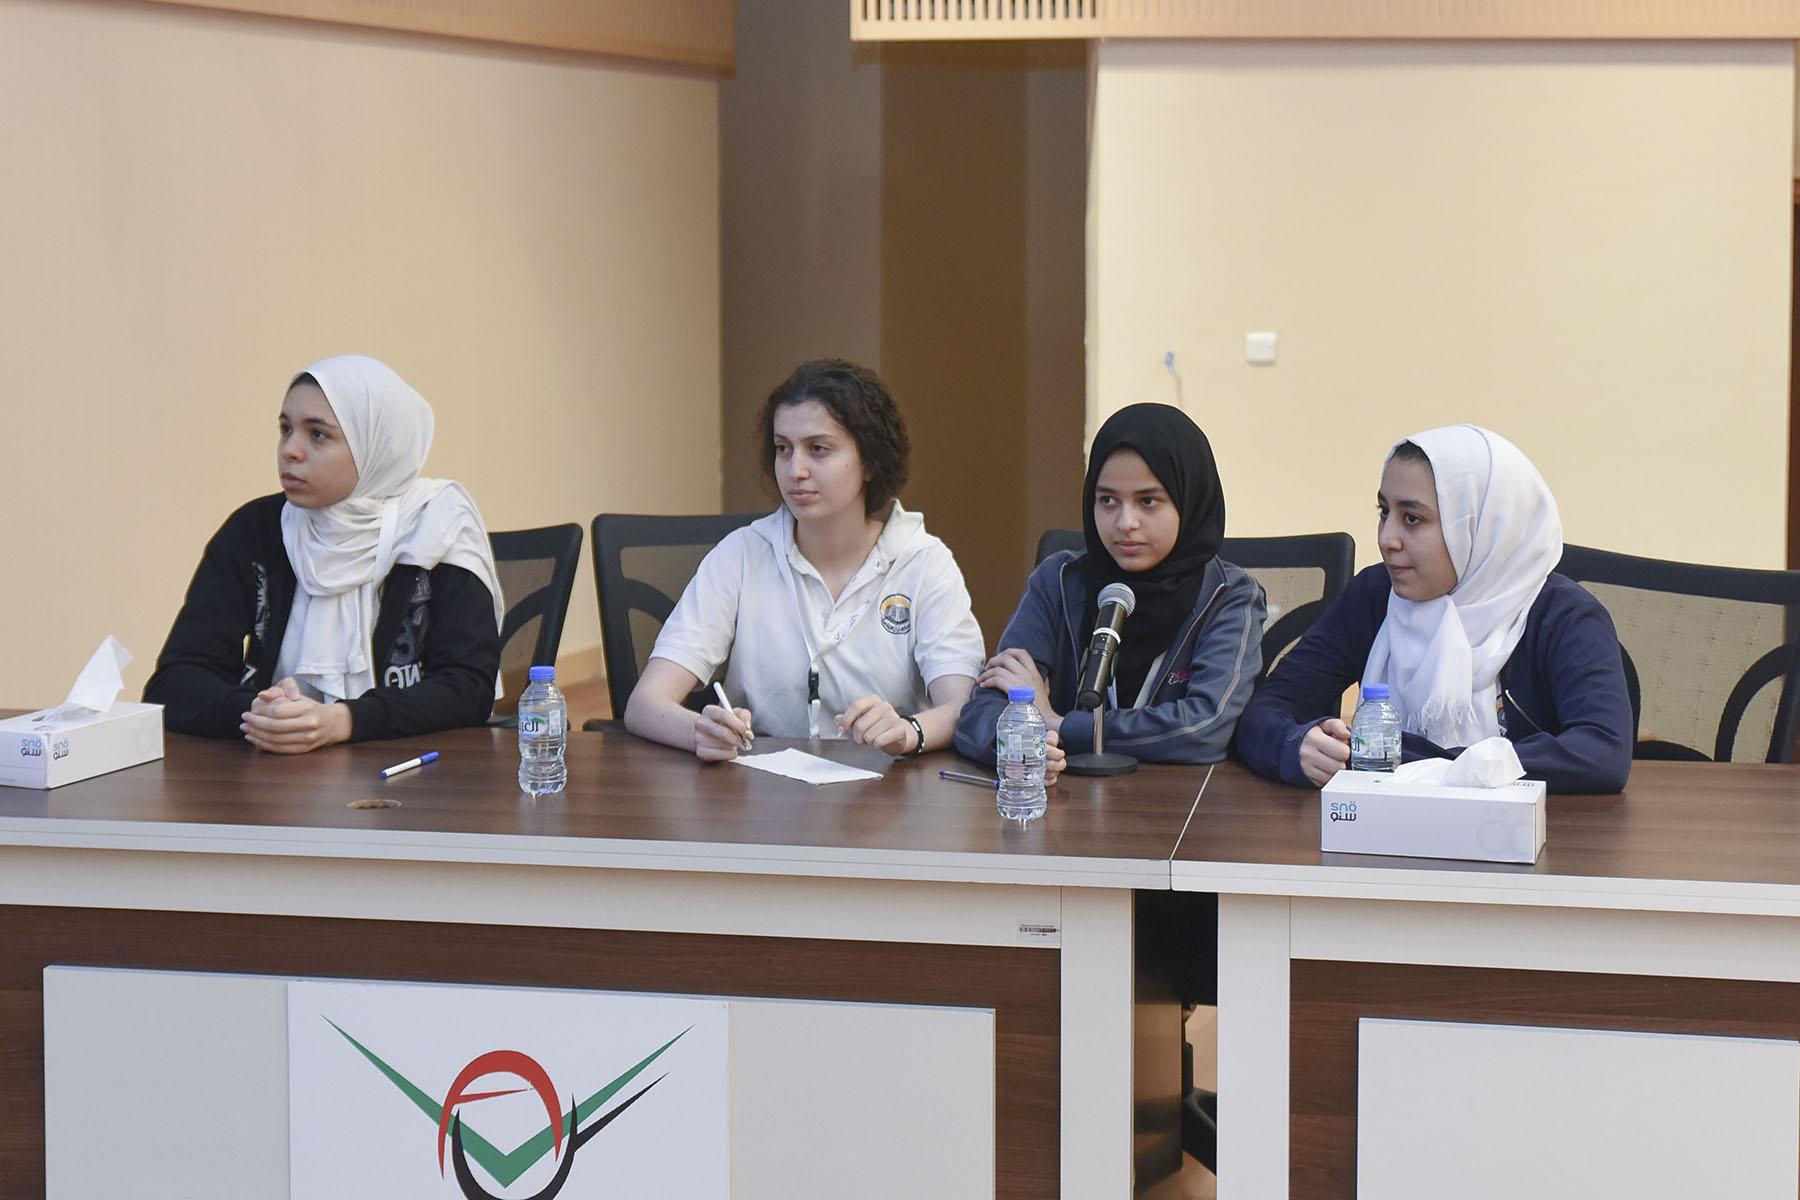 Semi-Final (Al Bashaer Private School VS Emirates Private School - Abu Dhabi)